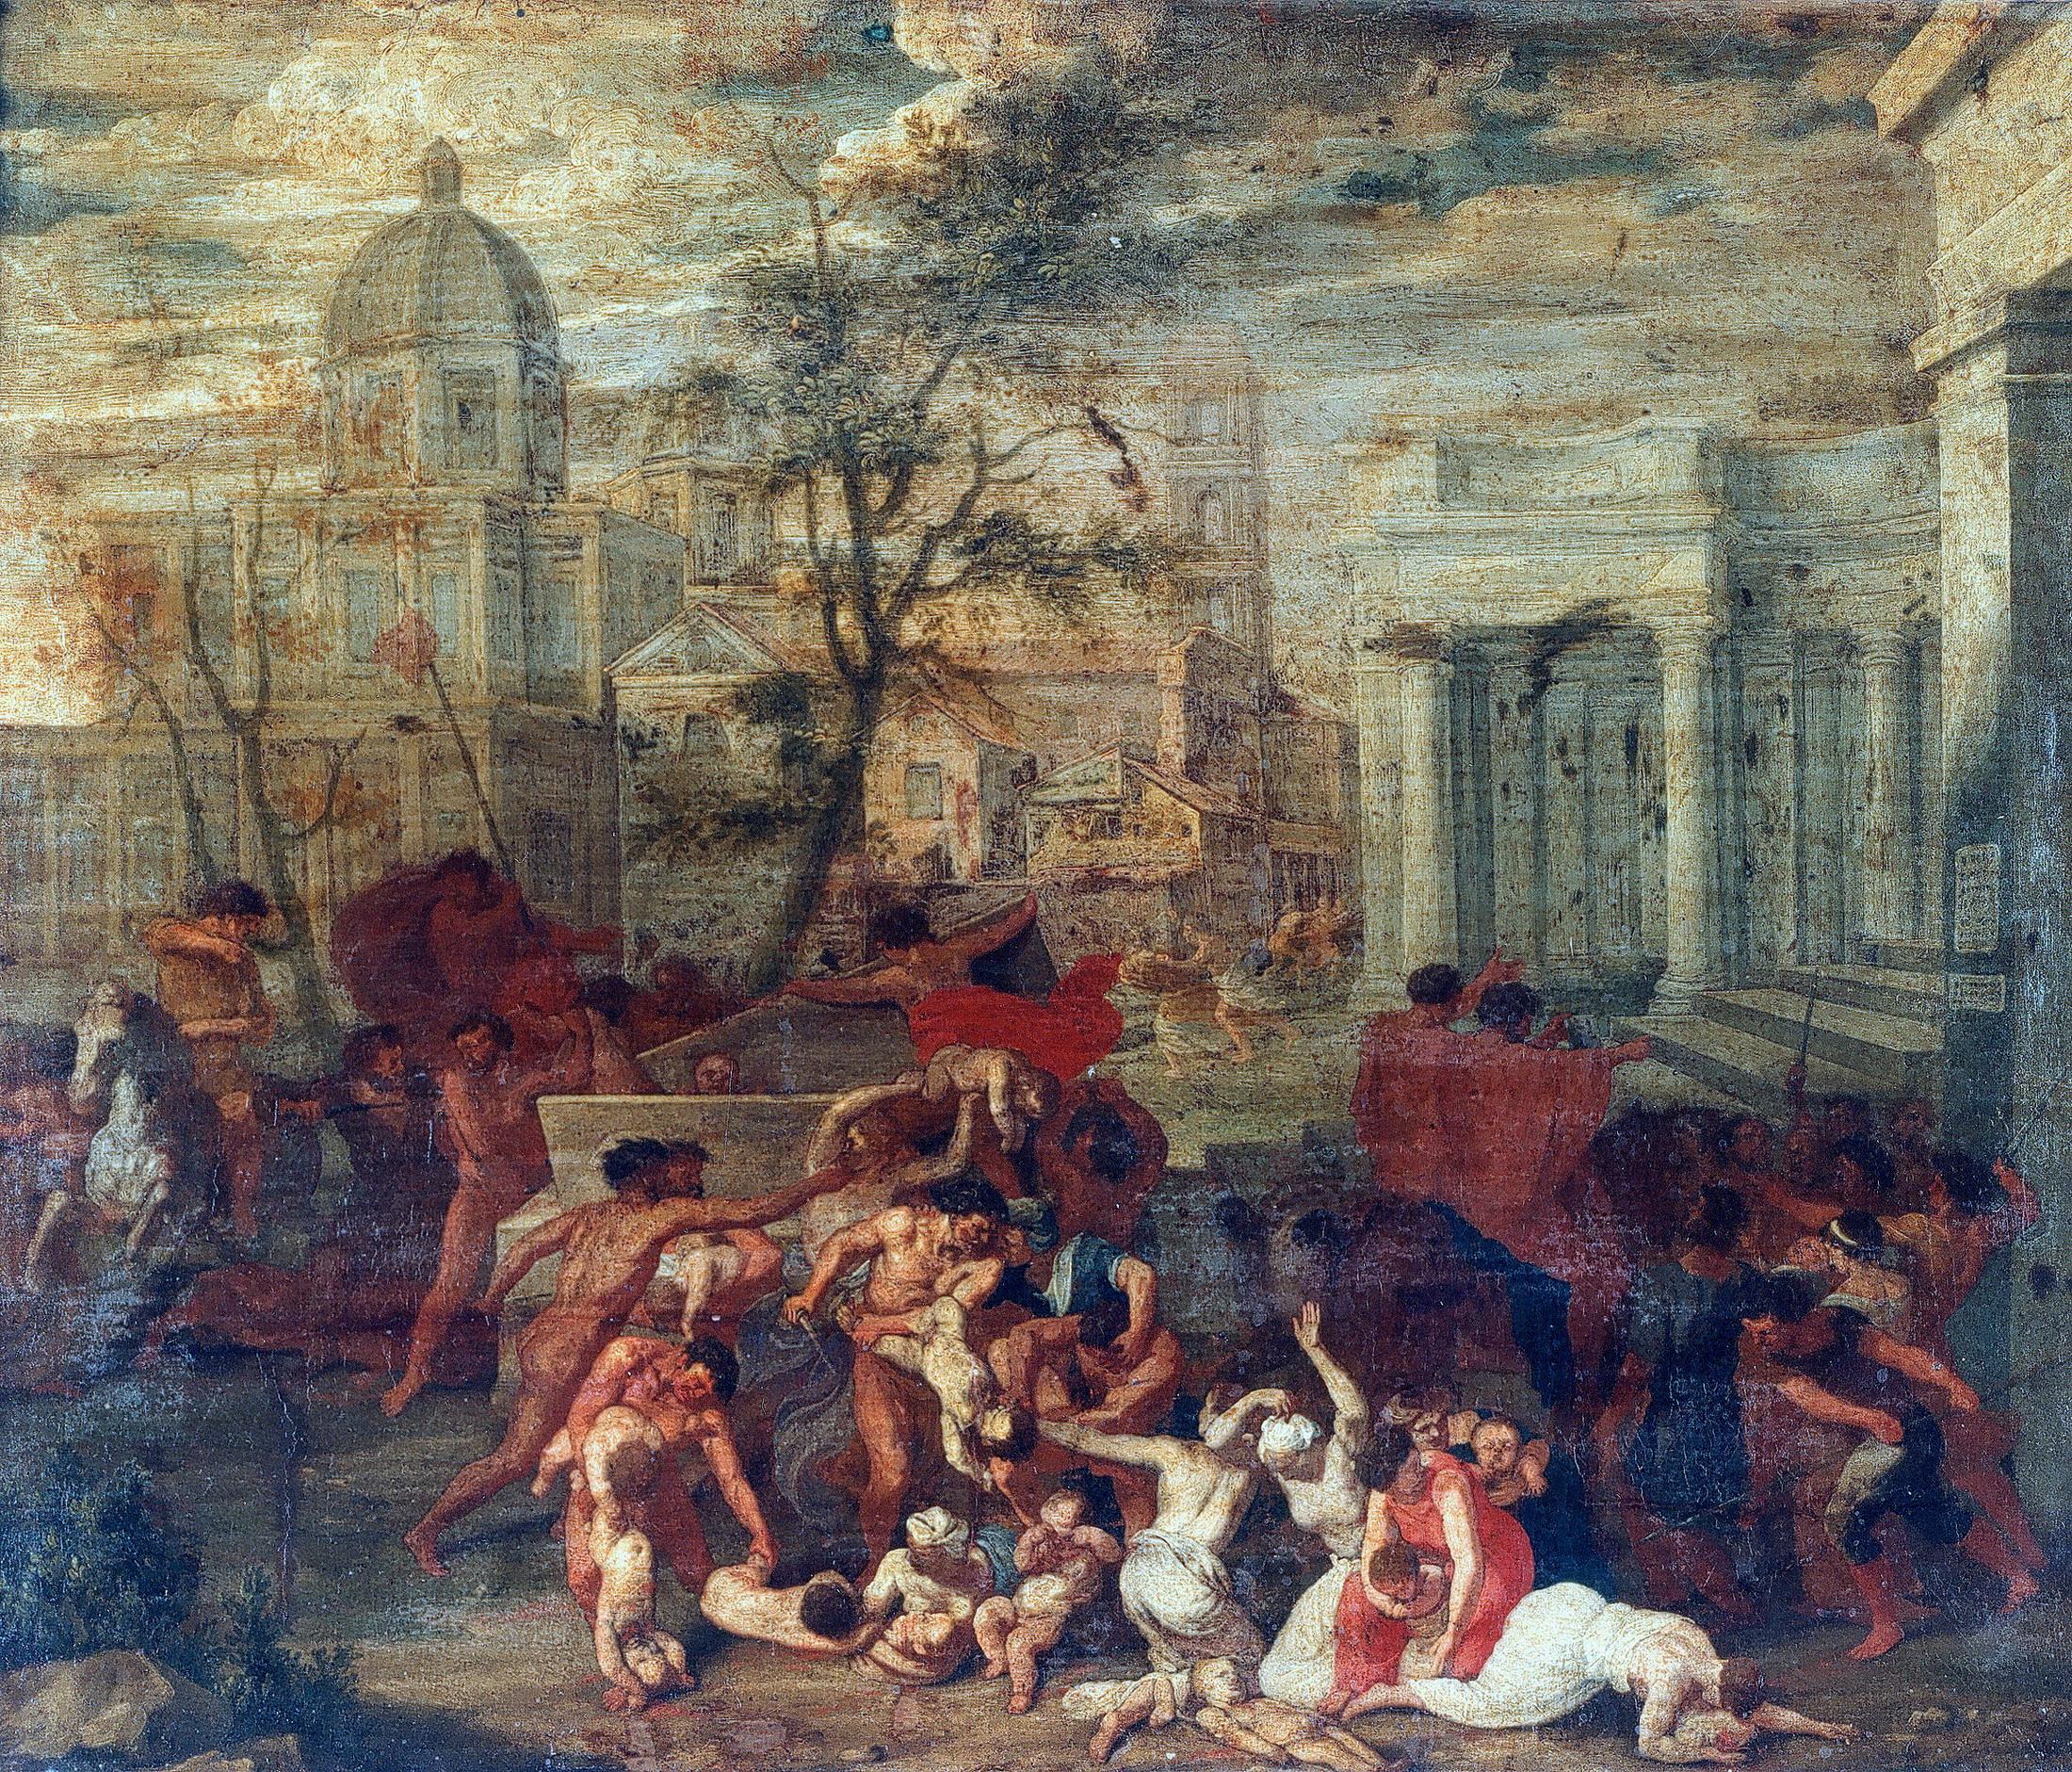 Art history 2011 - 2 part 3